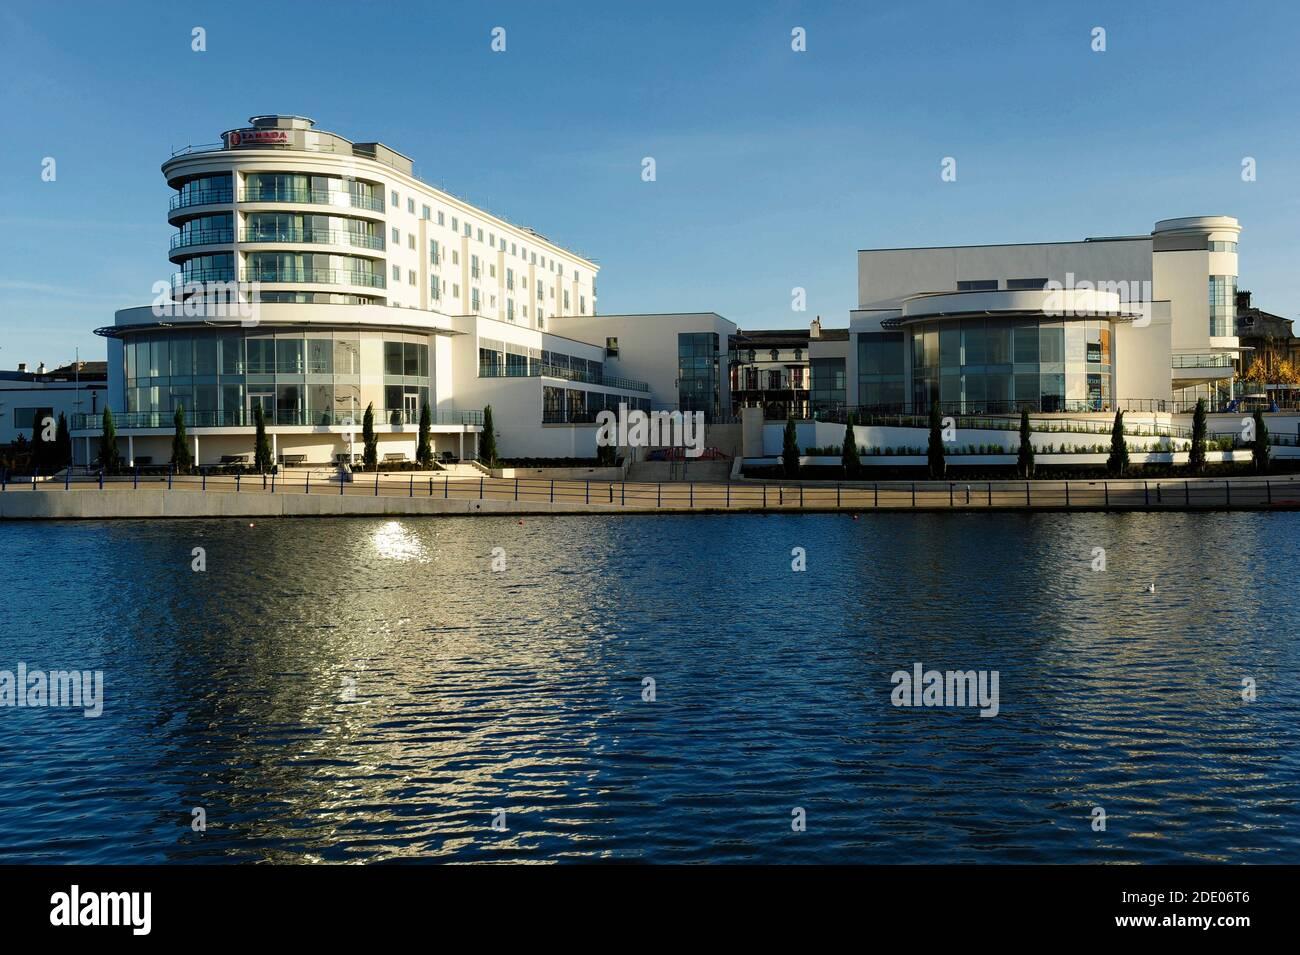 Ramada casino southport microgaming online casinos